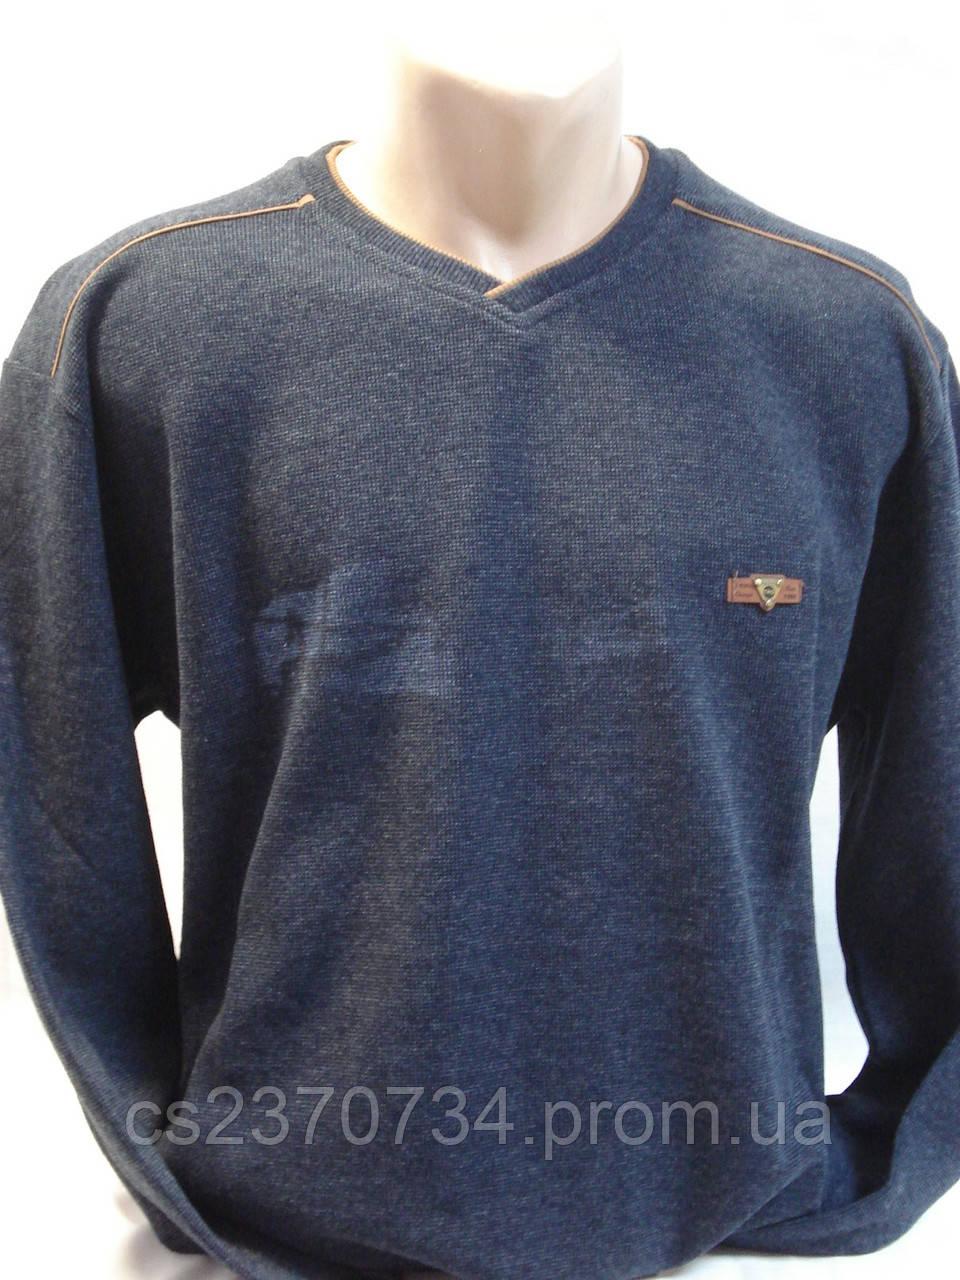 Футболка мужская T-RING  теплая джинс. цвет (3,4,5,6XL)